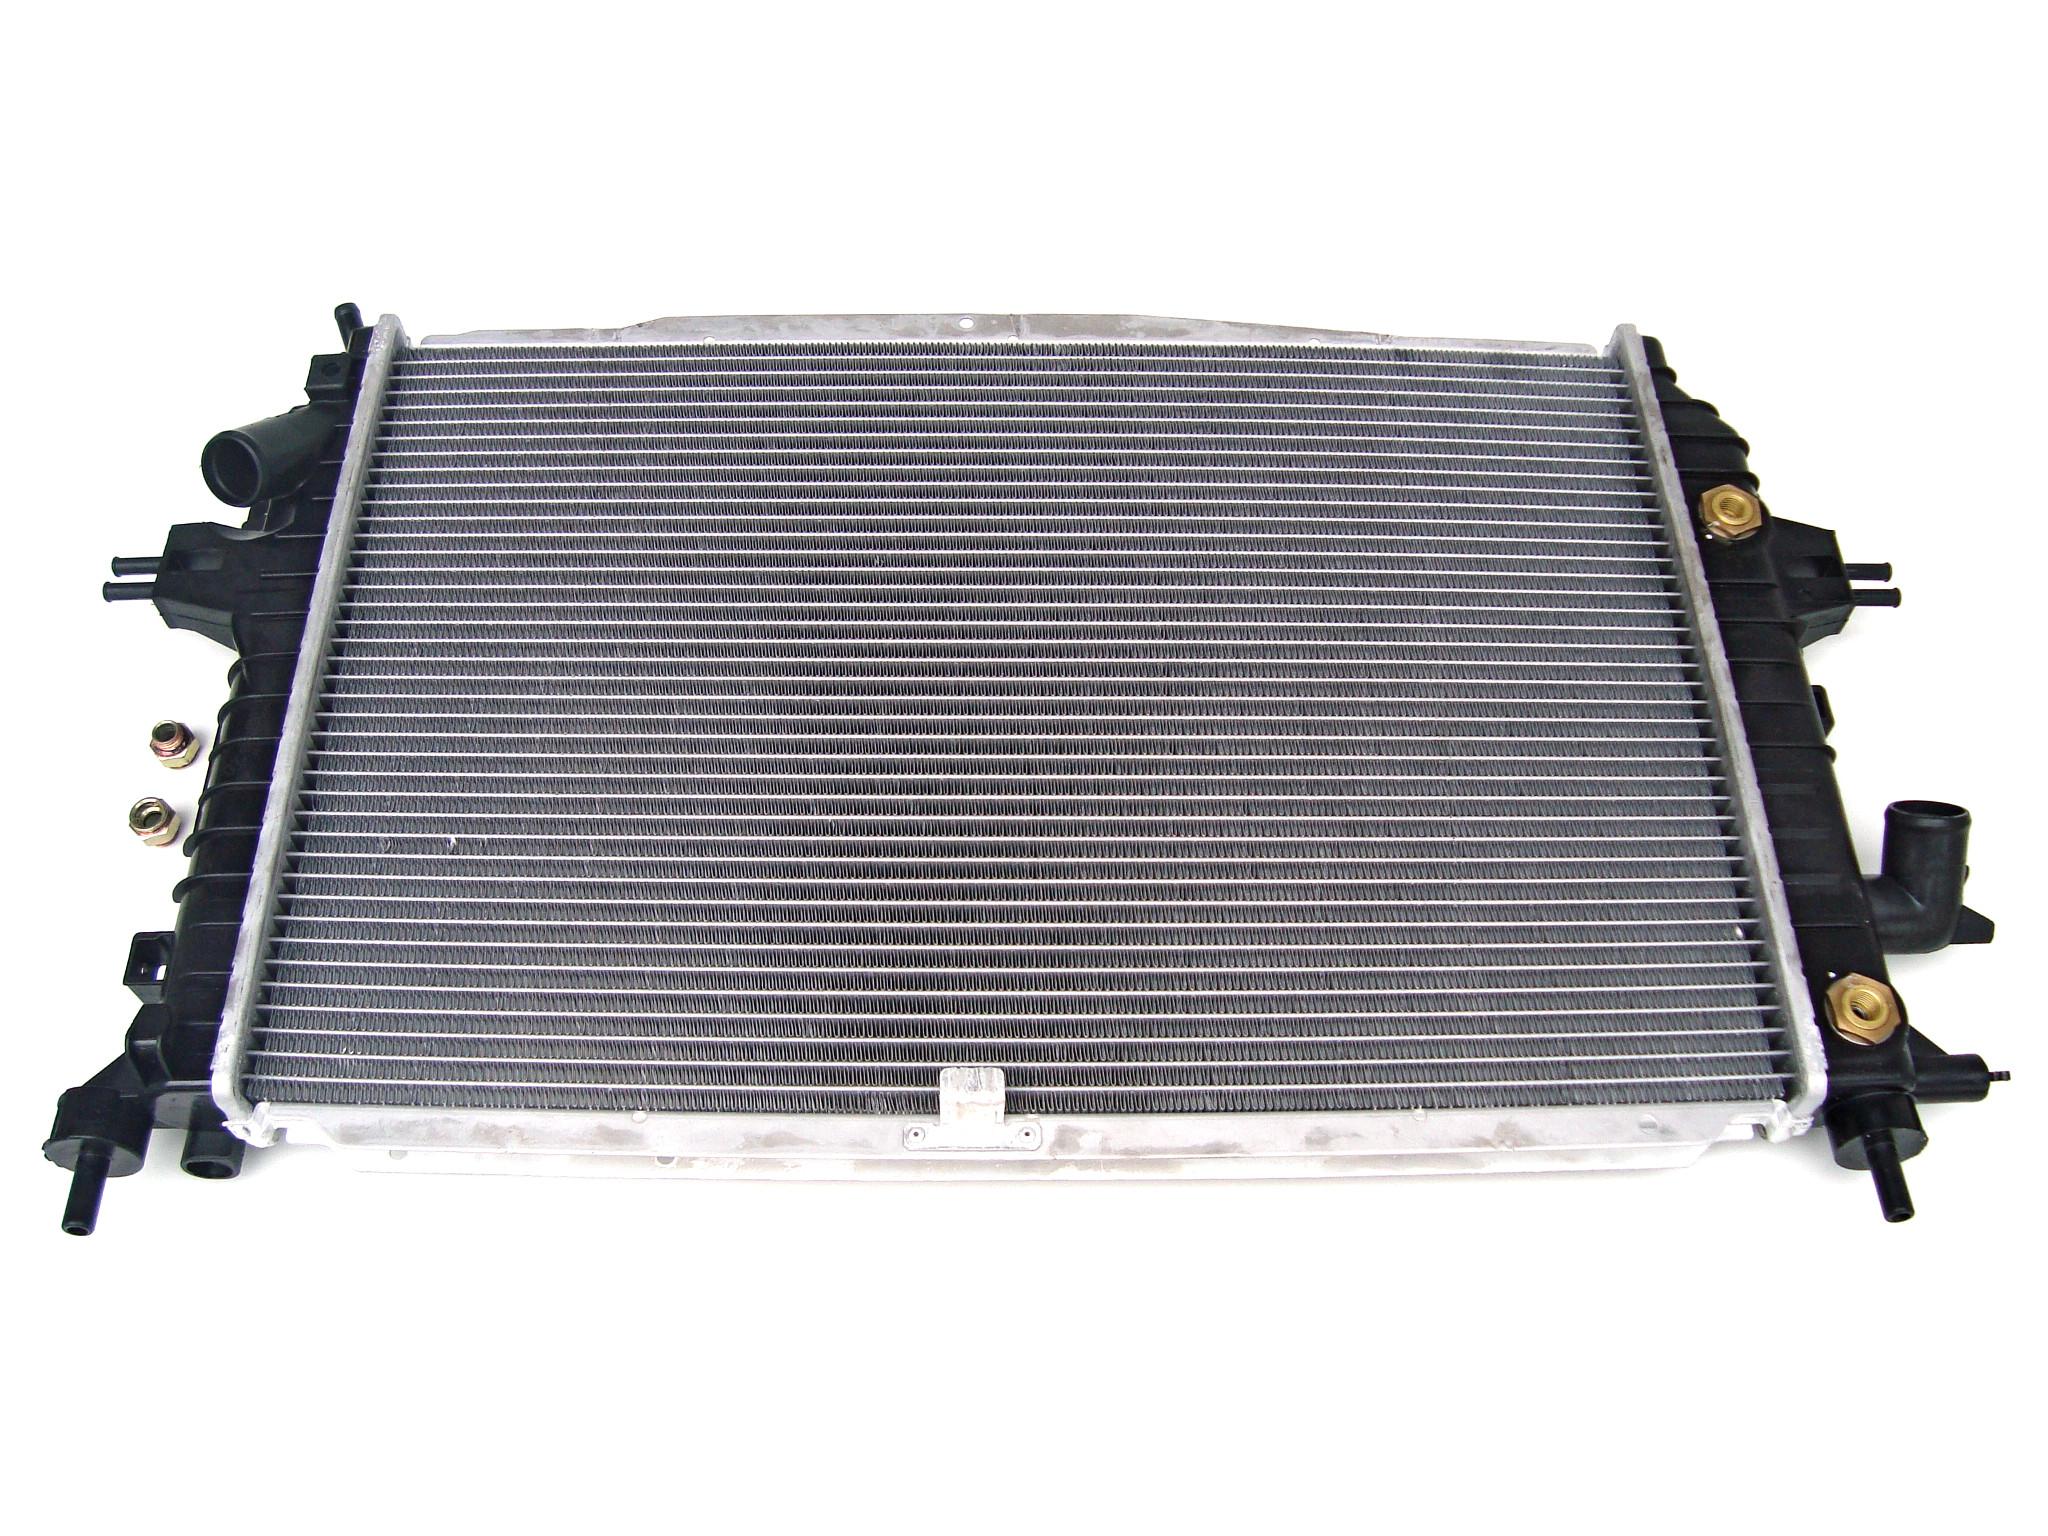 радиатор воды opel zafira b 17 19 cdti 20 2005